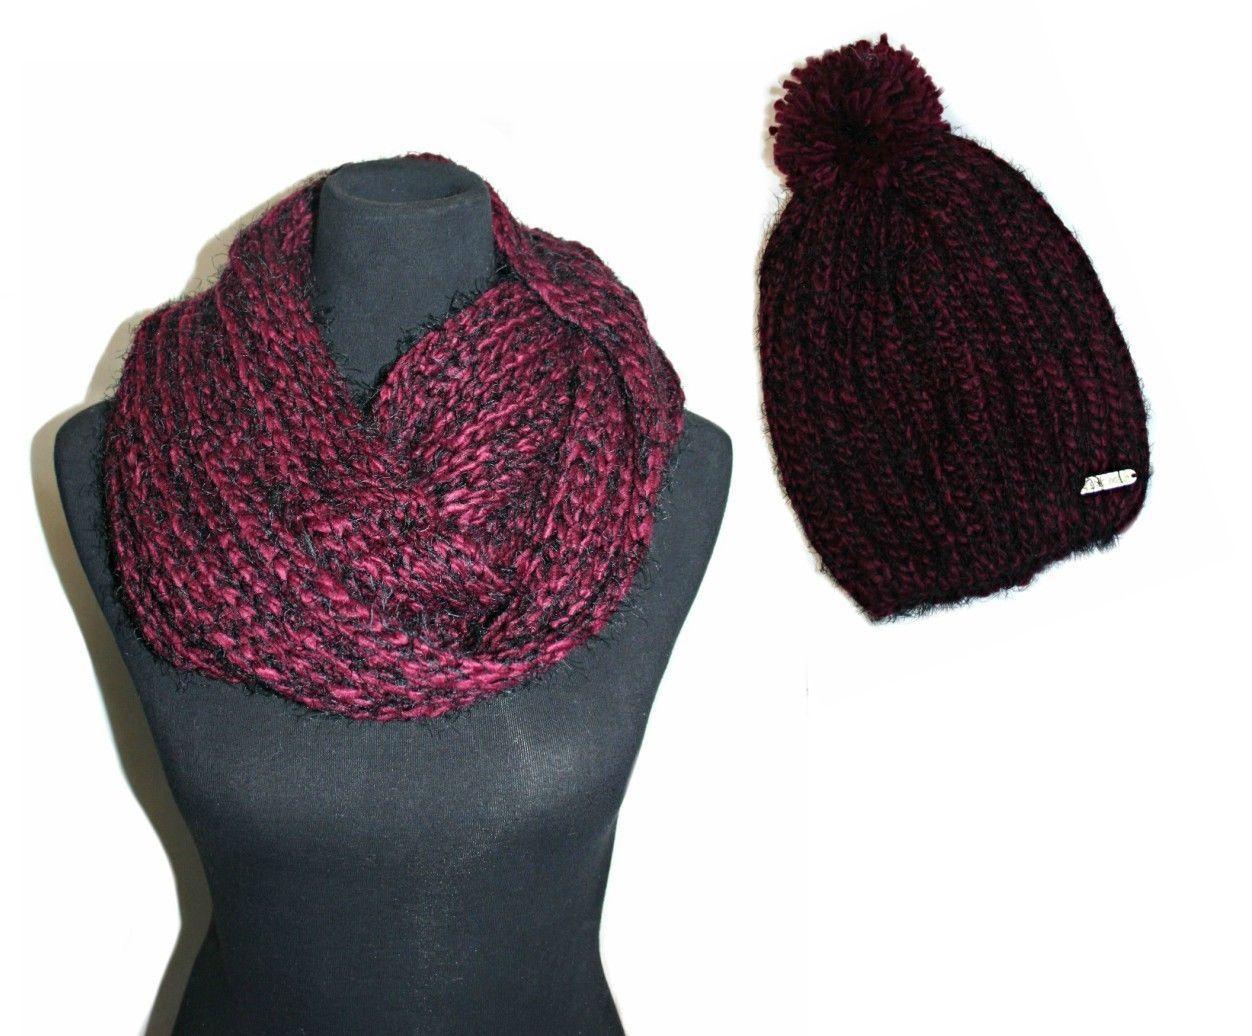 bebe 2 Pcs Cold Weather Set - Hat and Infinity Loop Scarf, Color: Burgundy/Black - $32.99